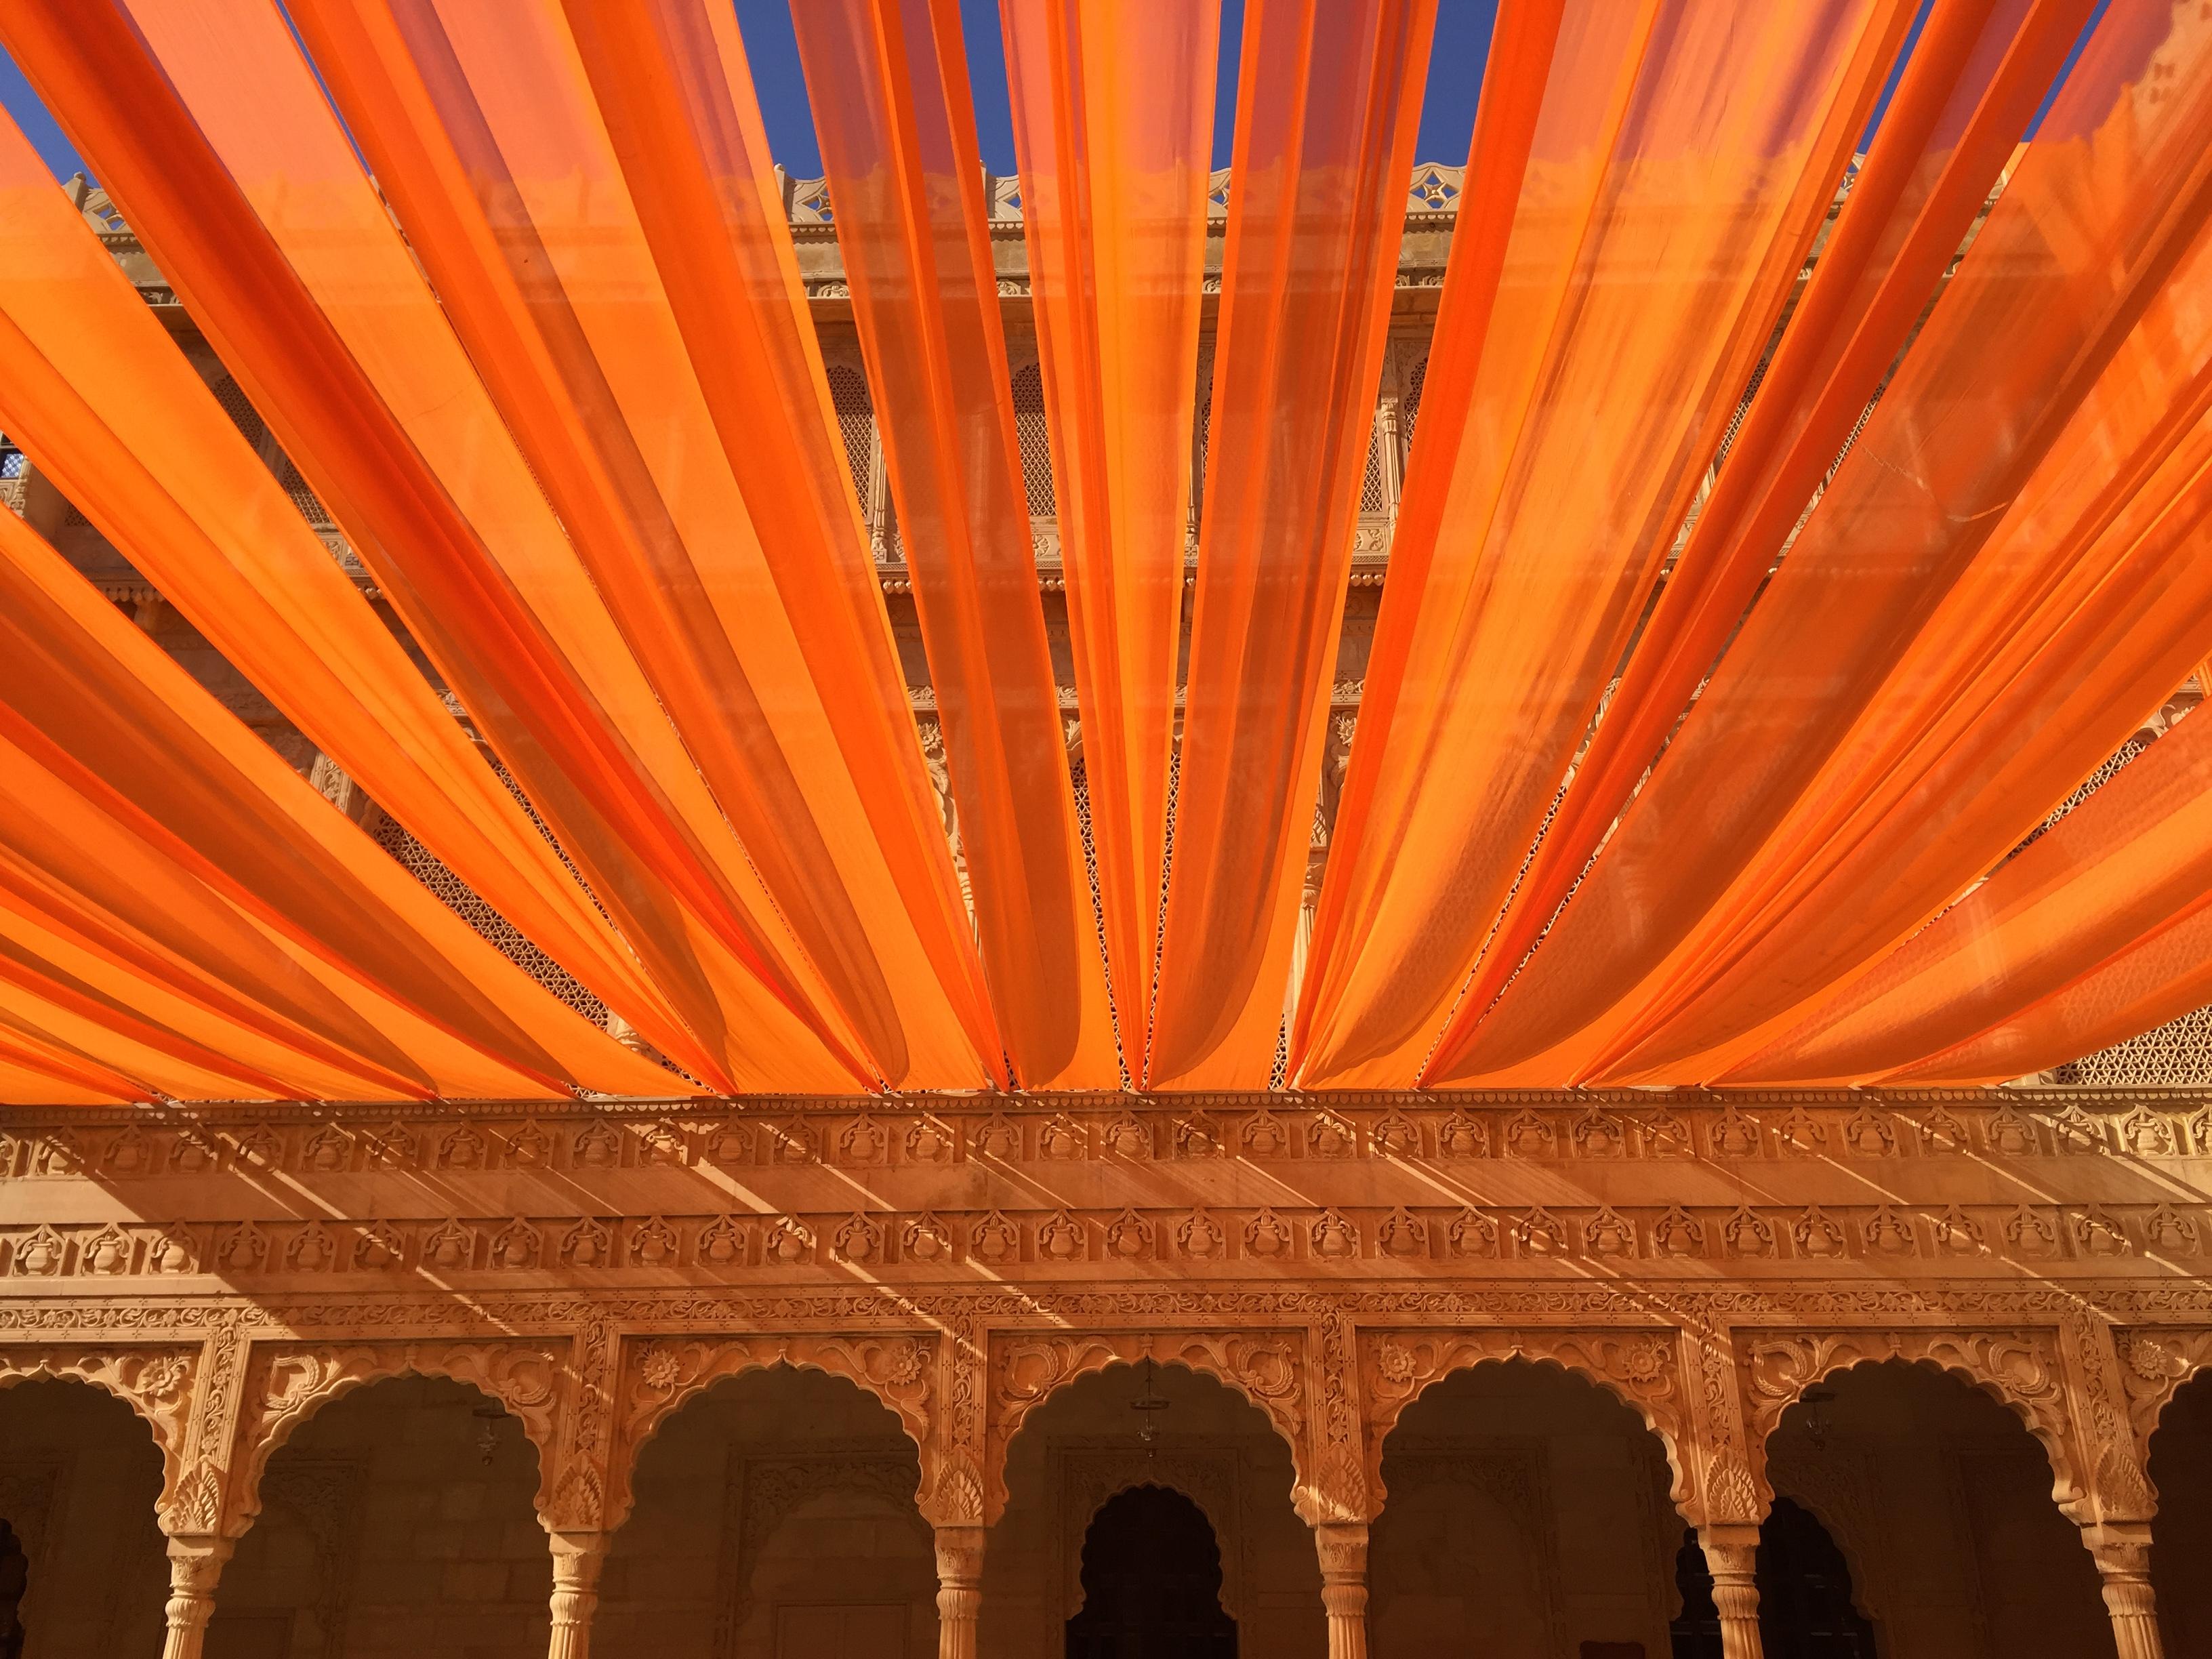 Suryagarh – The Gateway To The Thar